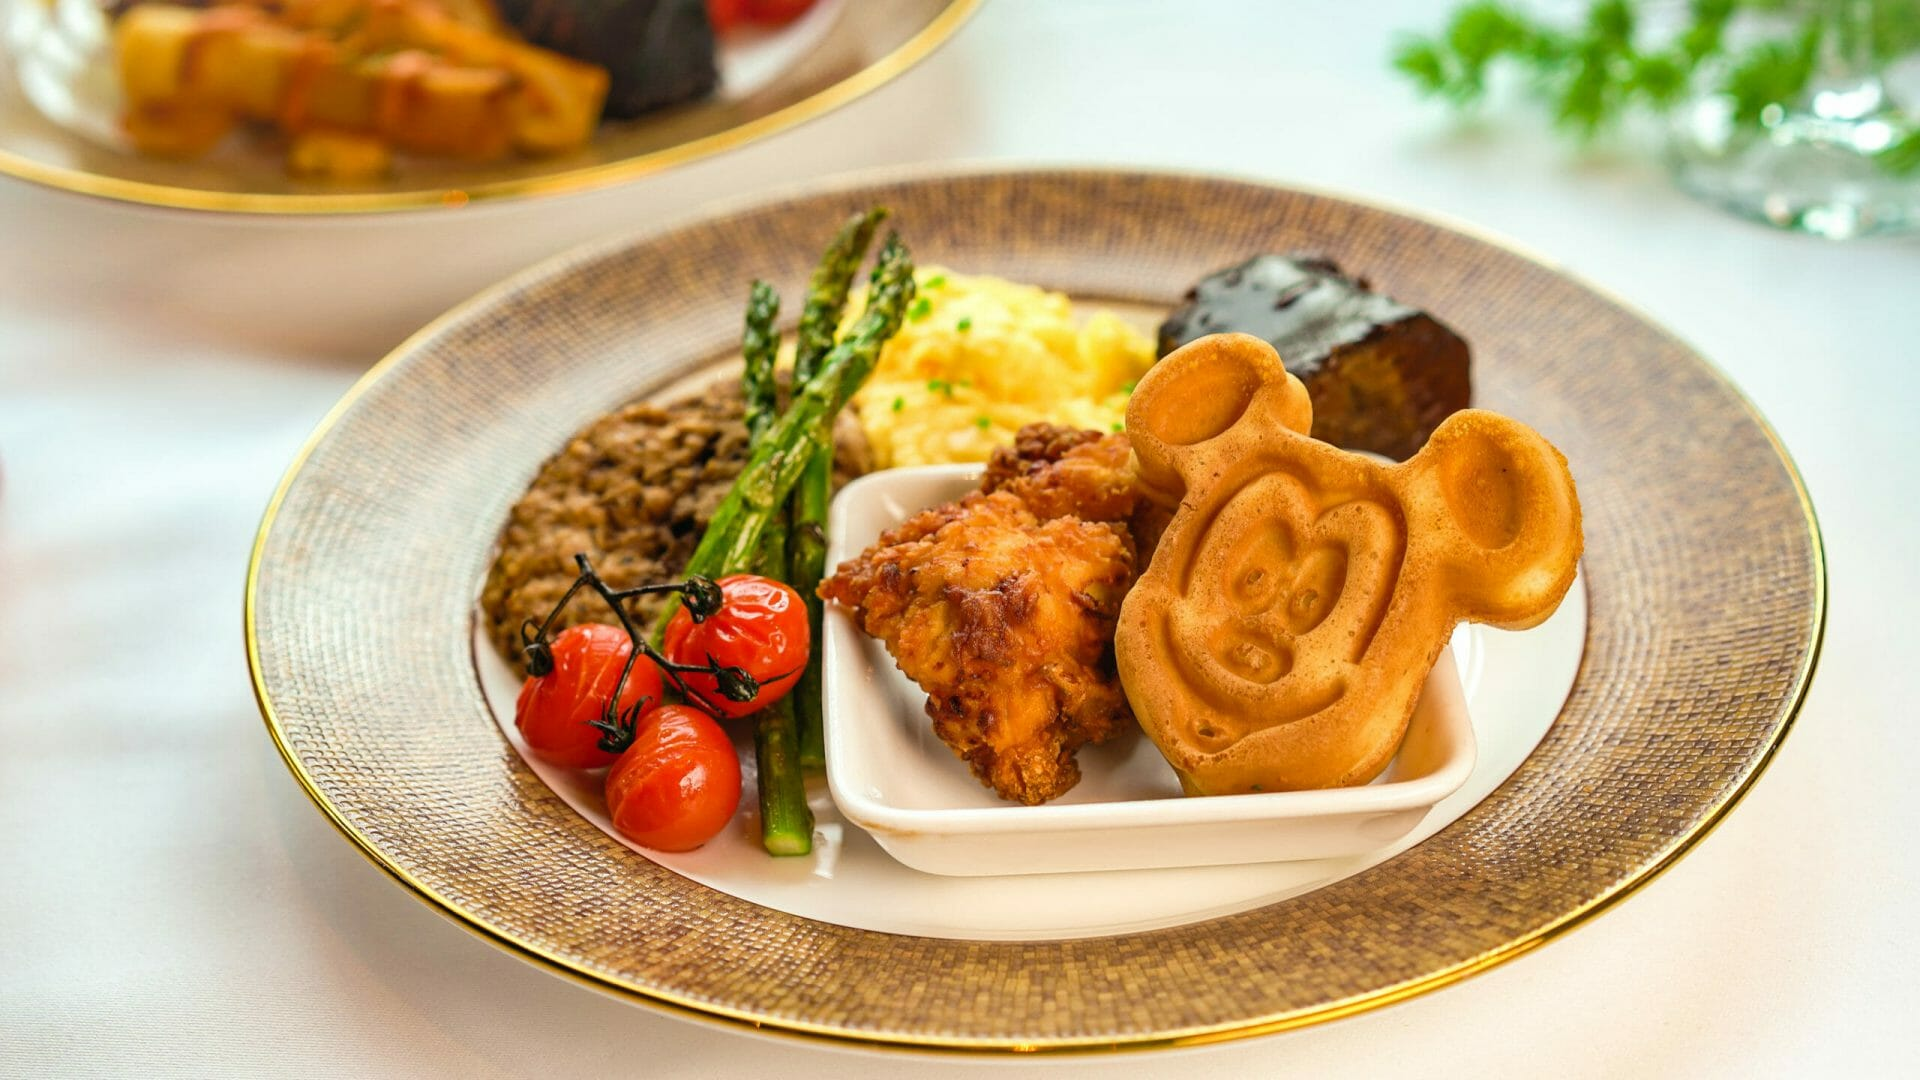 Best Places to get Breakfast at Disneyland Resort